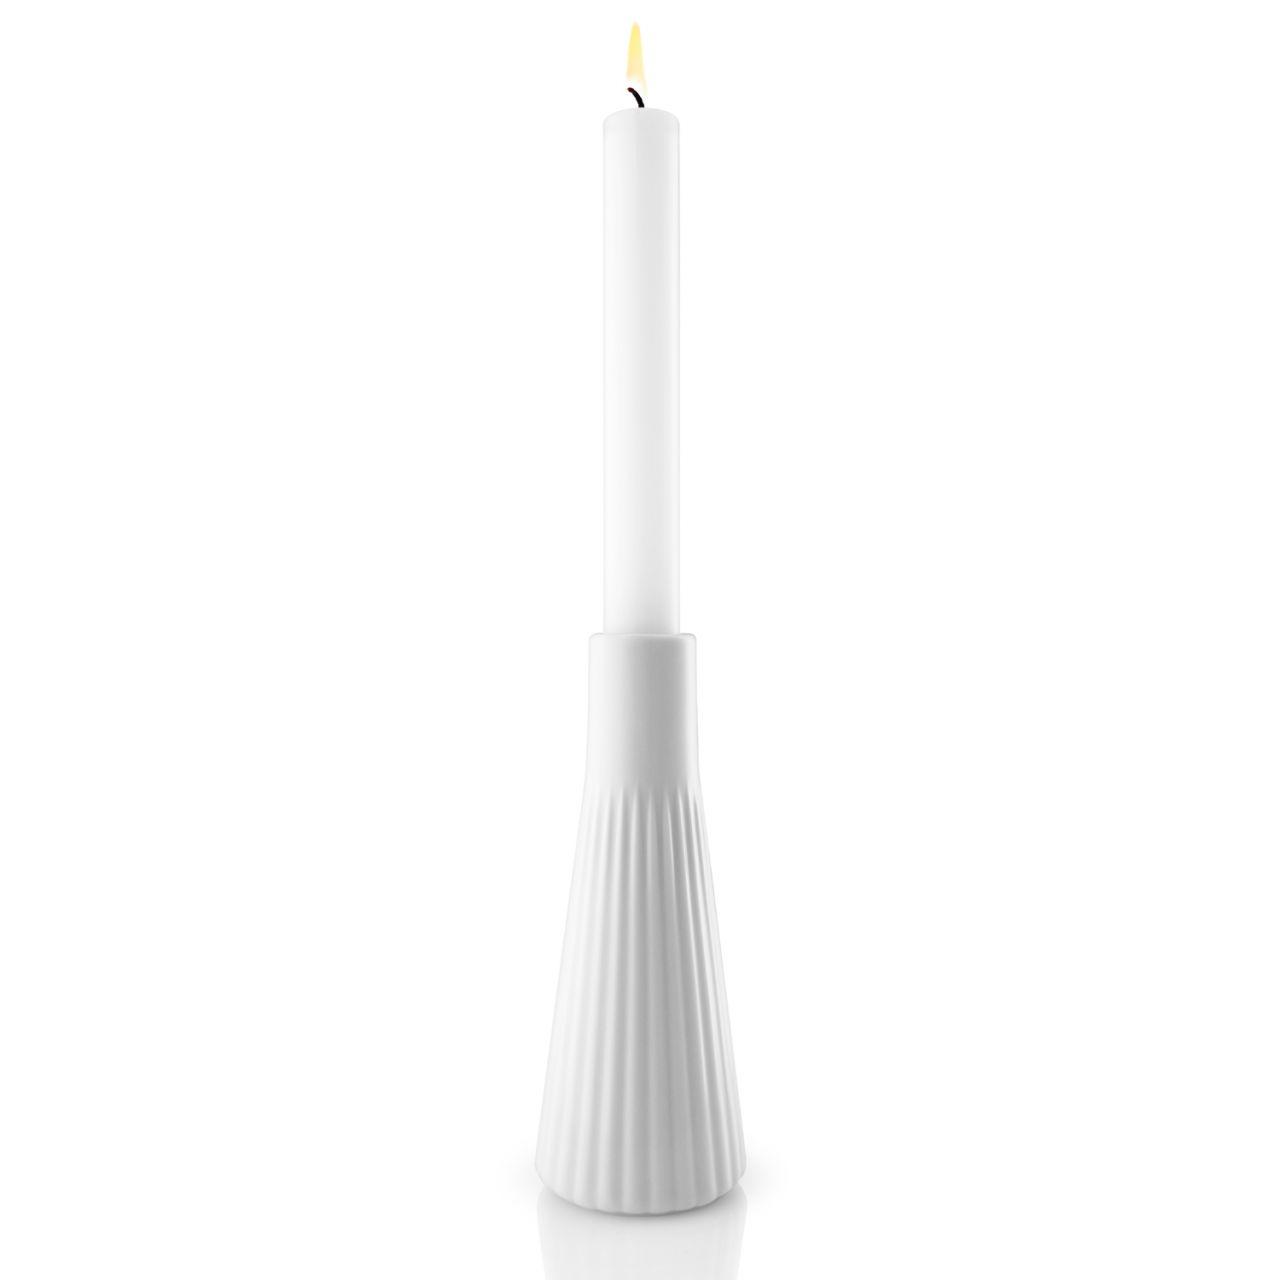 Eva Solo - Legio Nova Kerzenständer 887289